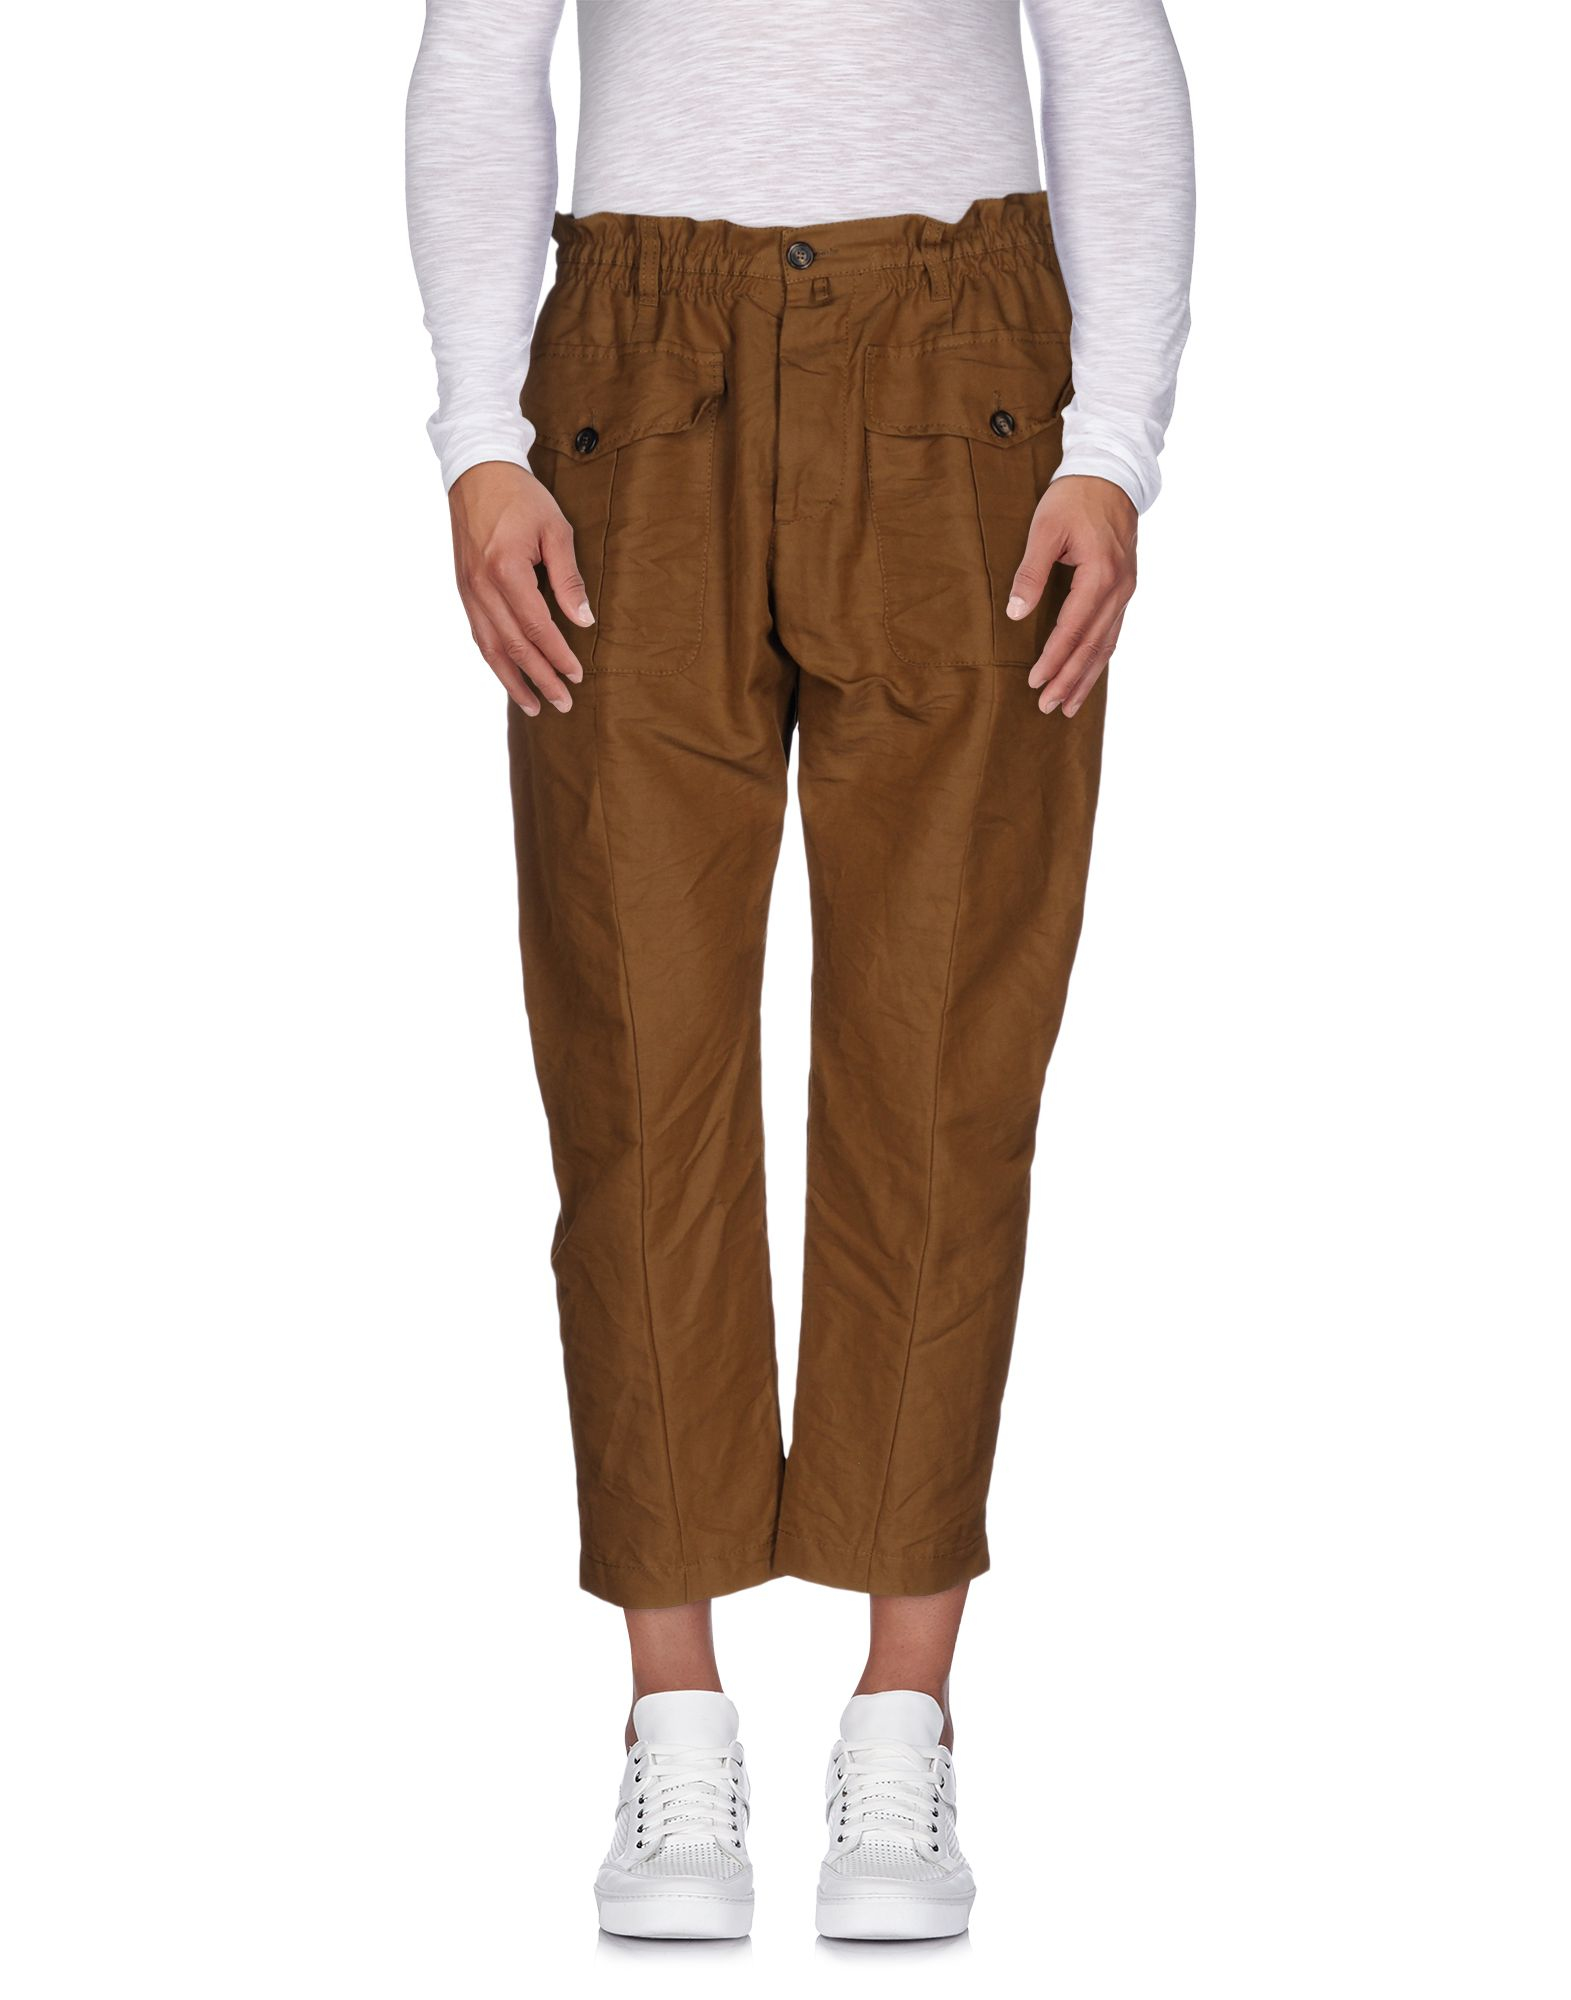 Perfect New Womens Ladies Khaki Green Brown Wide Leg Combat Trousers Cargo